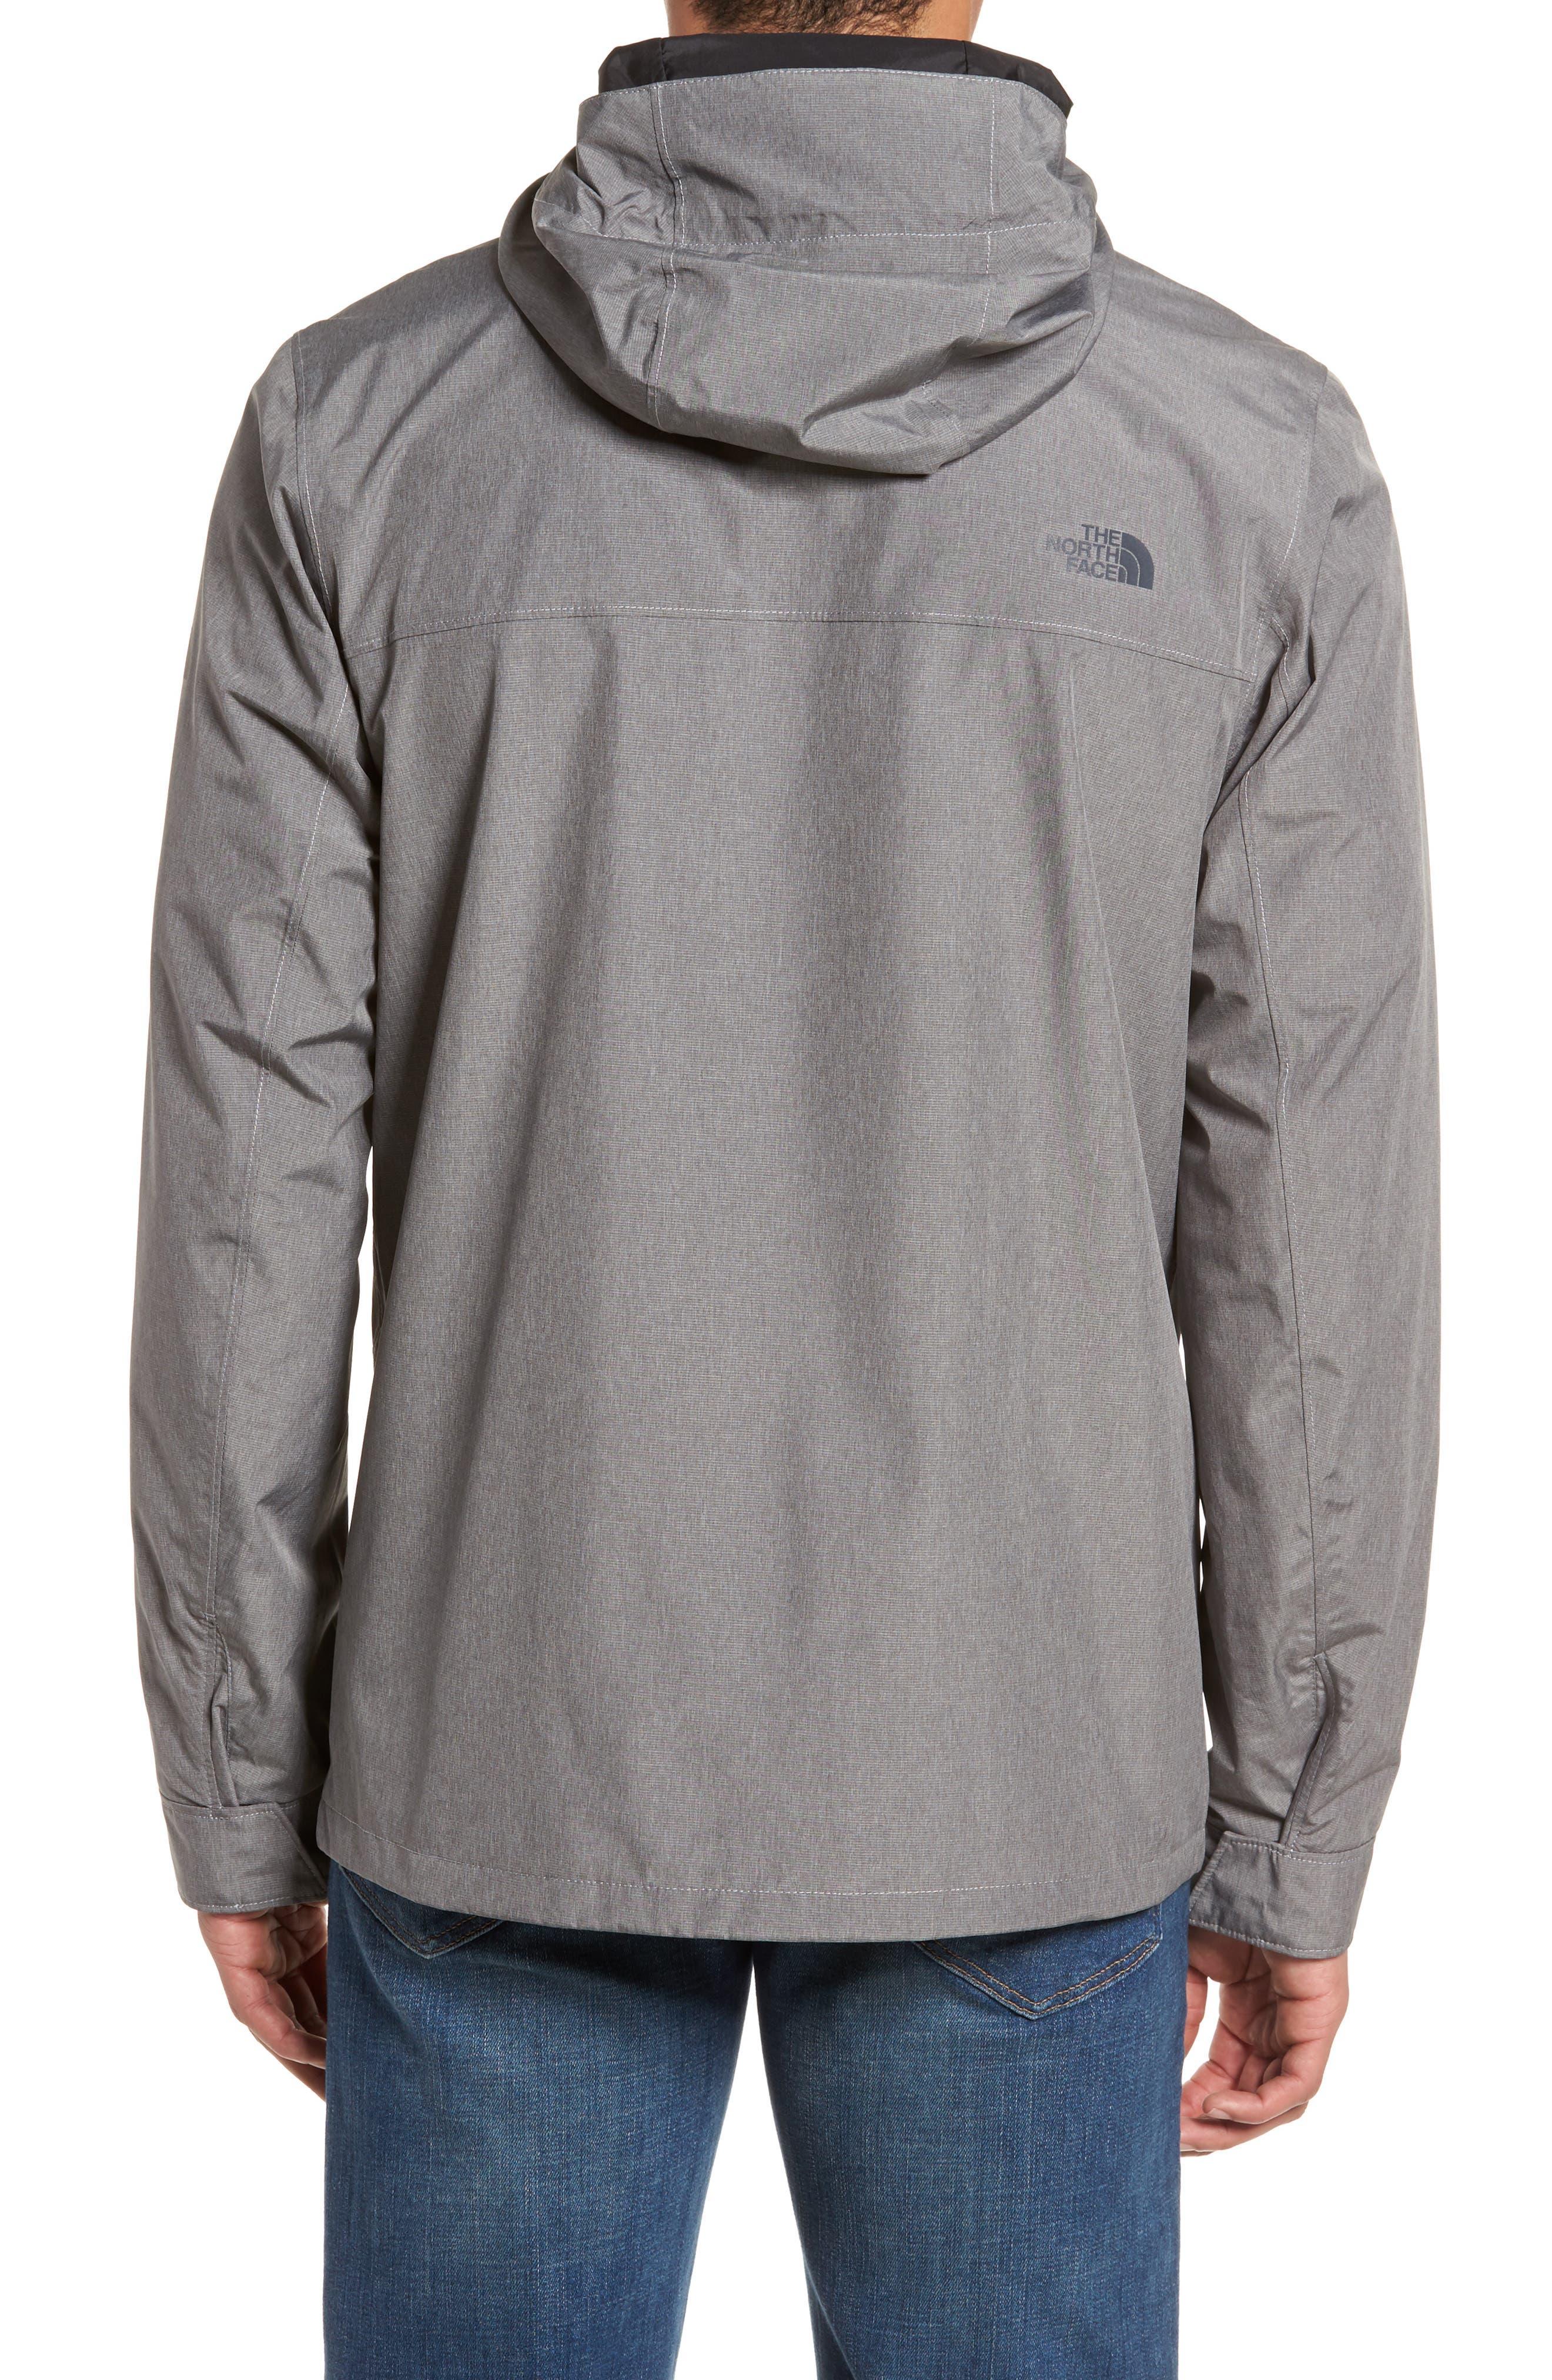 Jenison II Insulated Waterproof Jacket,                             Alternate thumbnail 2, color,                             TNF MEDIUM GREY HEATHER